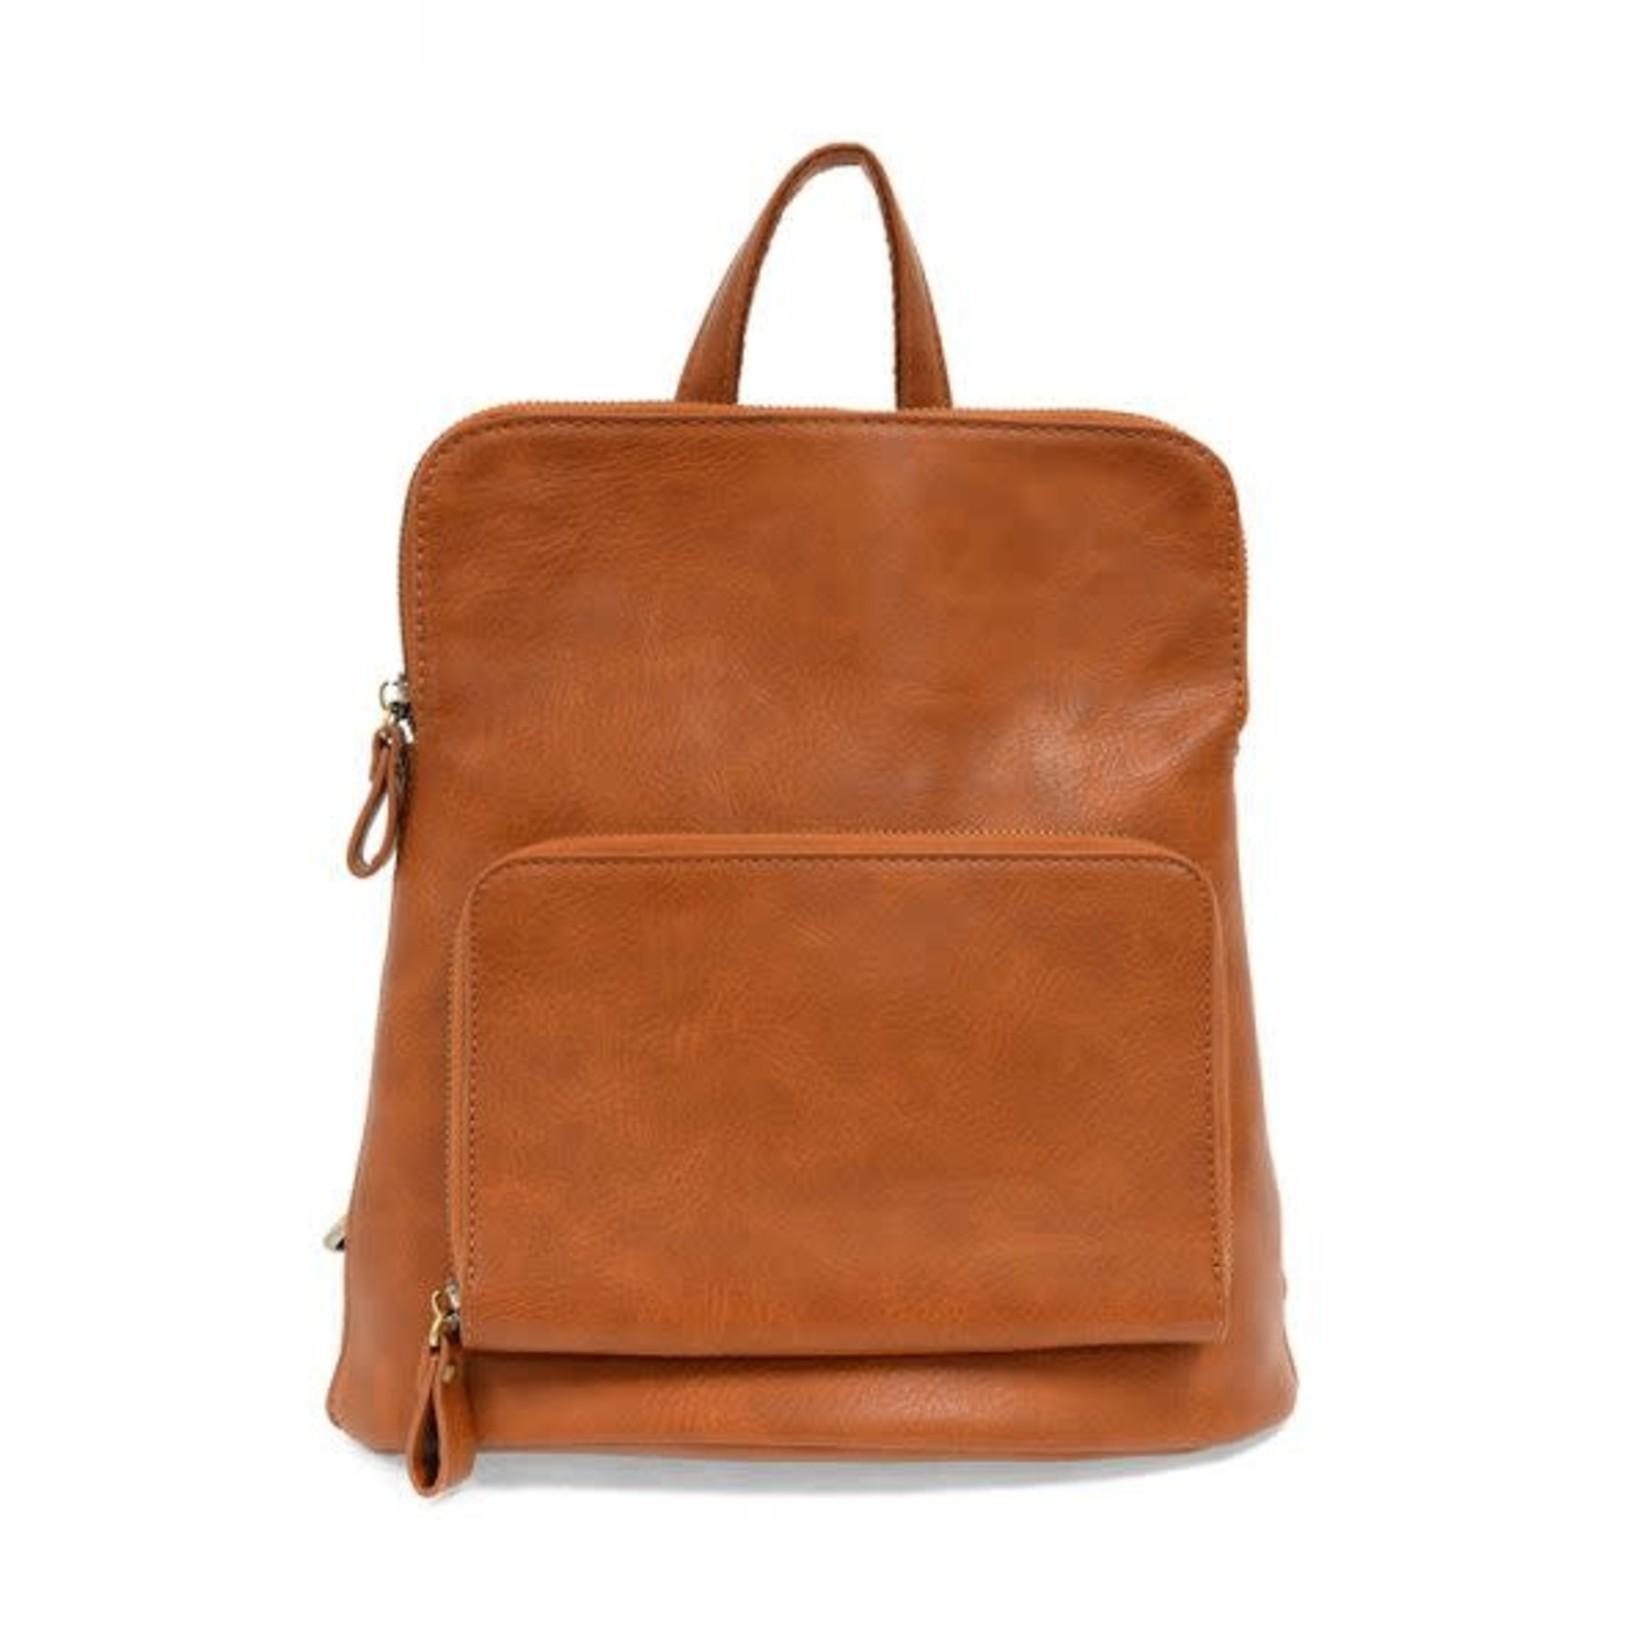 Joy Accessories Julia Mini Backpack in Chicory